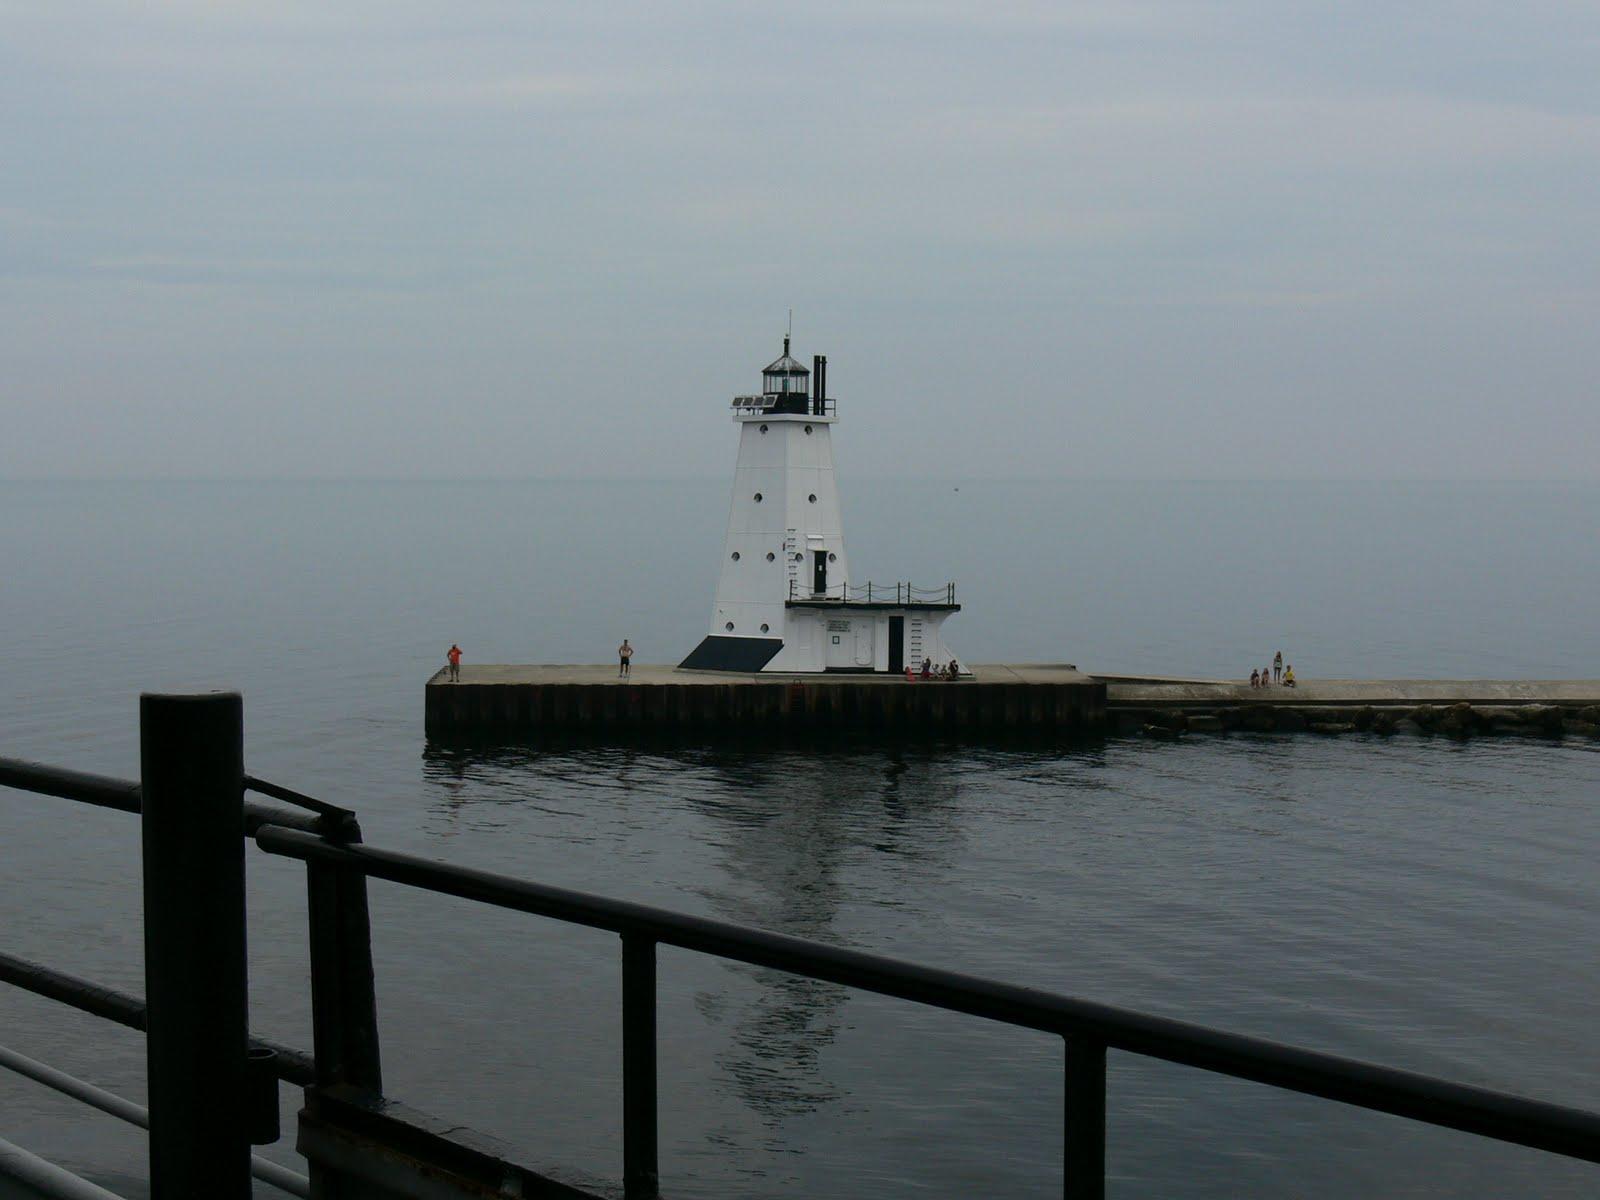 21st Century Odyssey: Car ferry across Lake Michigan